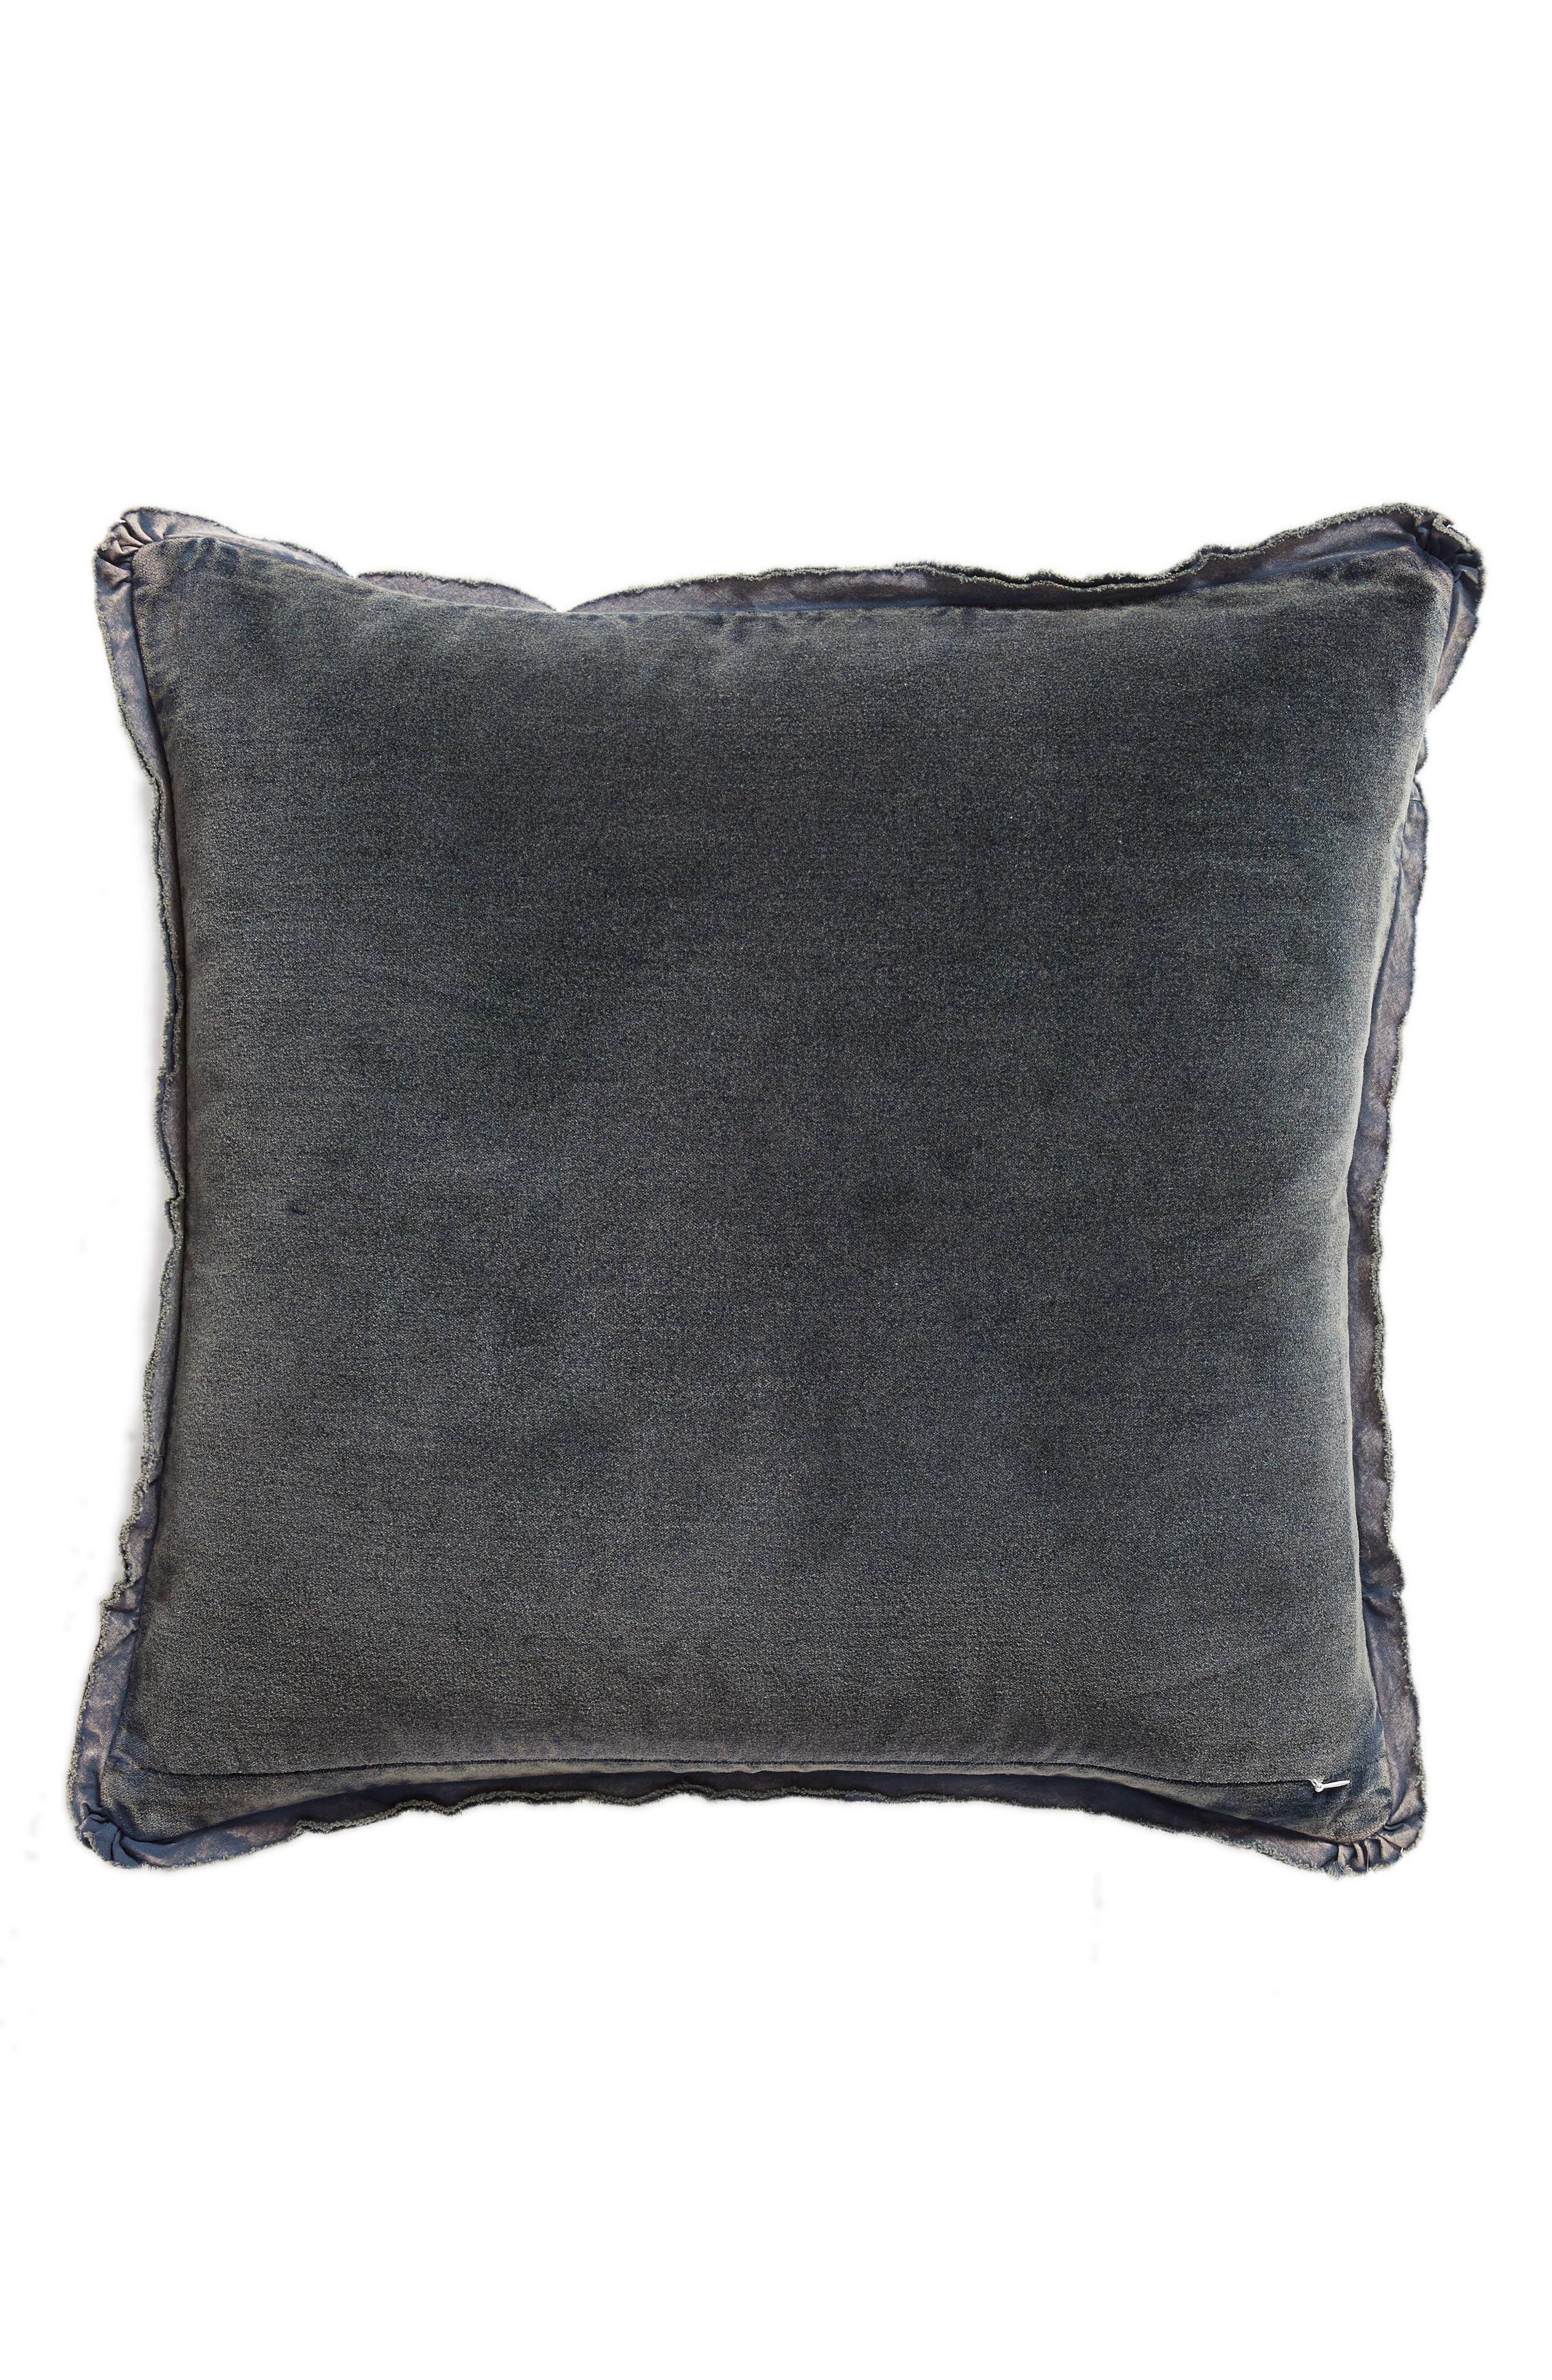 TREASURE & BOND, Stonewash Velvet Accent Pillow, Alternate thumbnail 2, color, NAVY BLUE